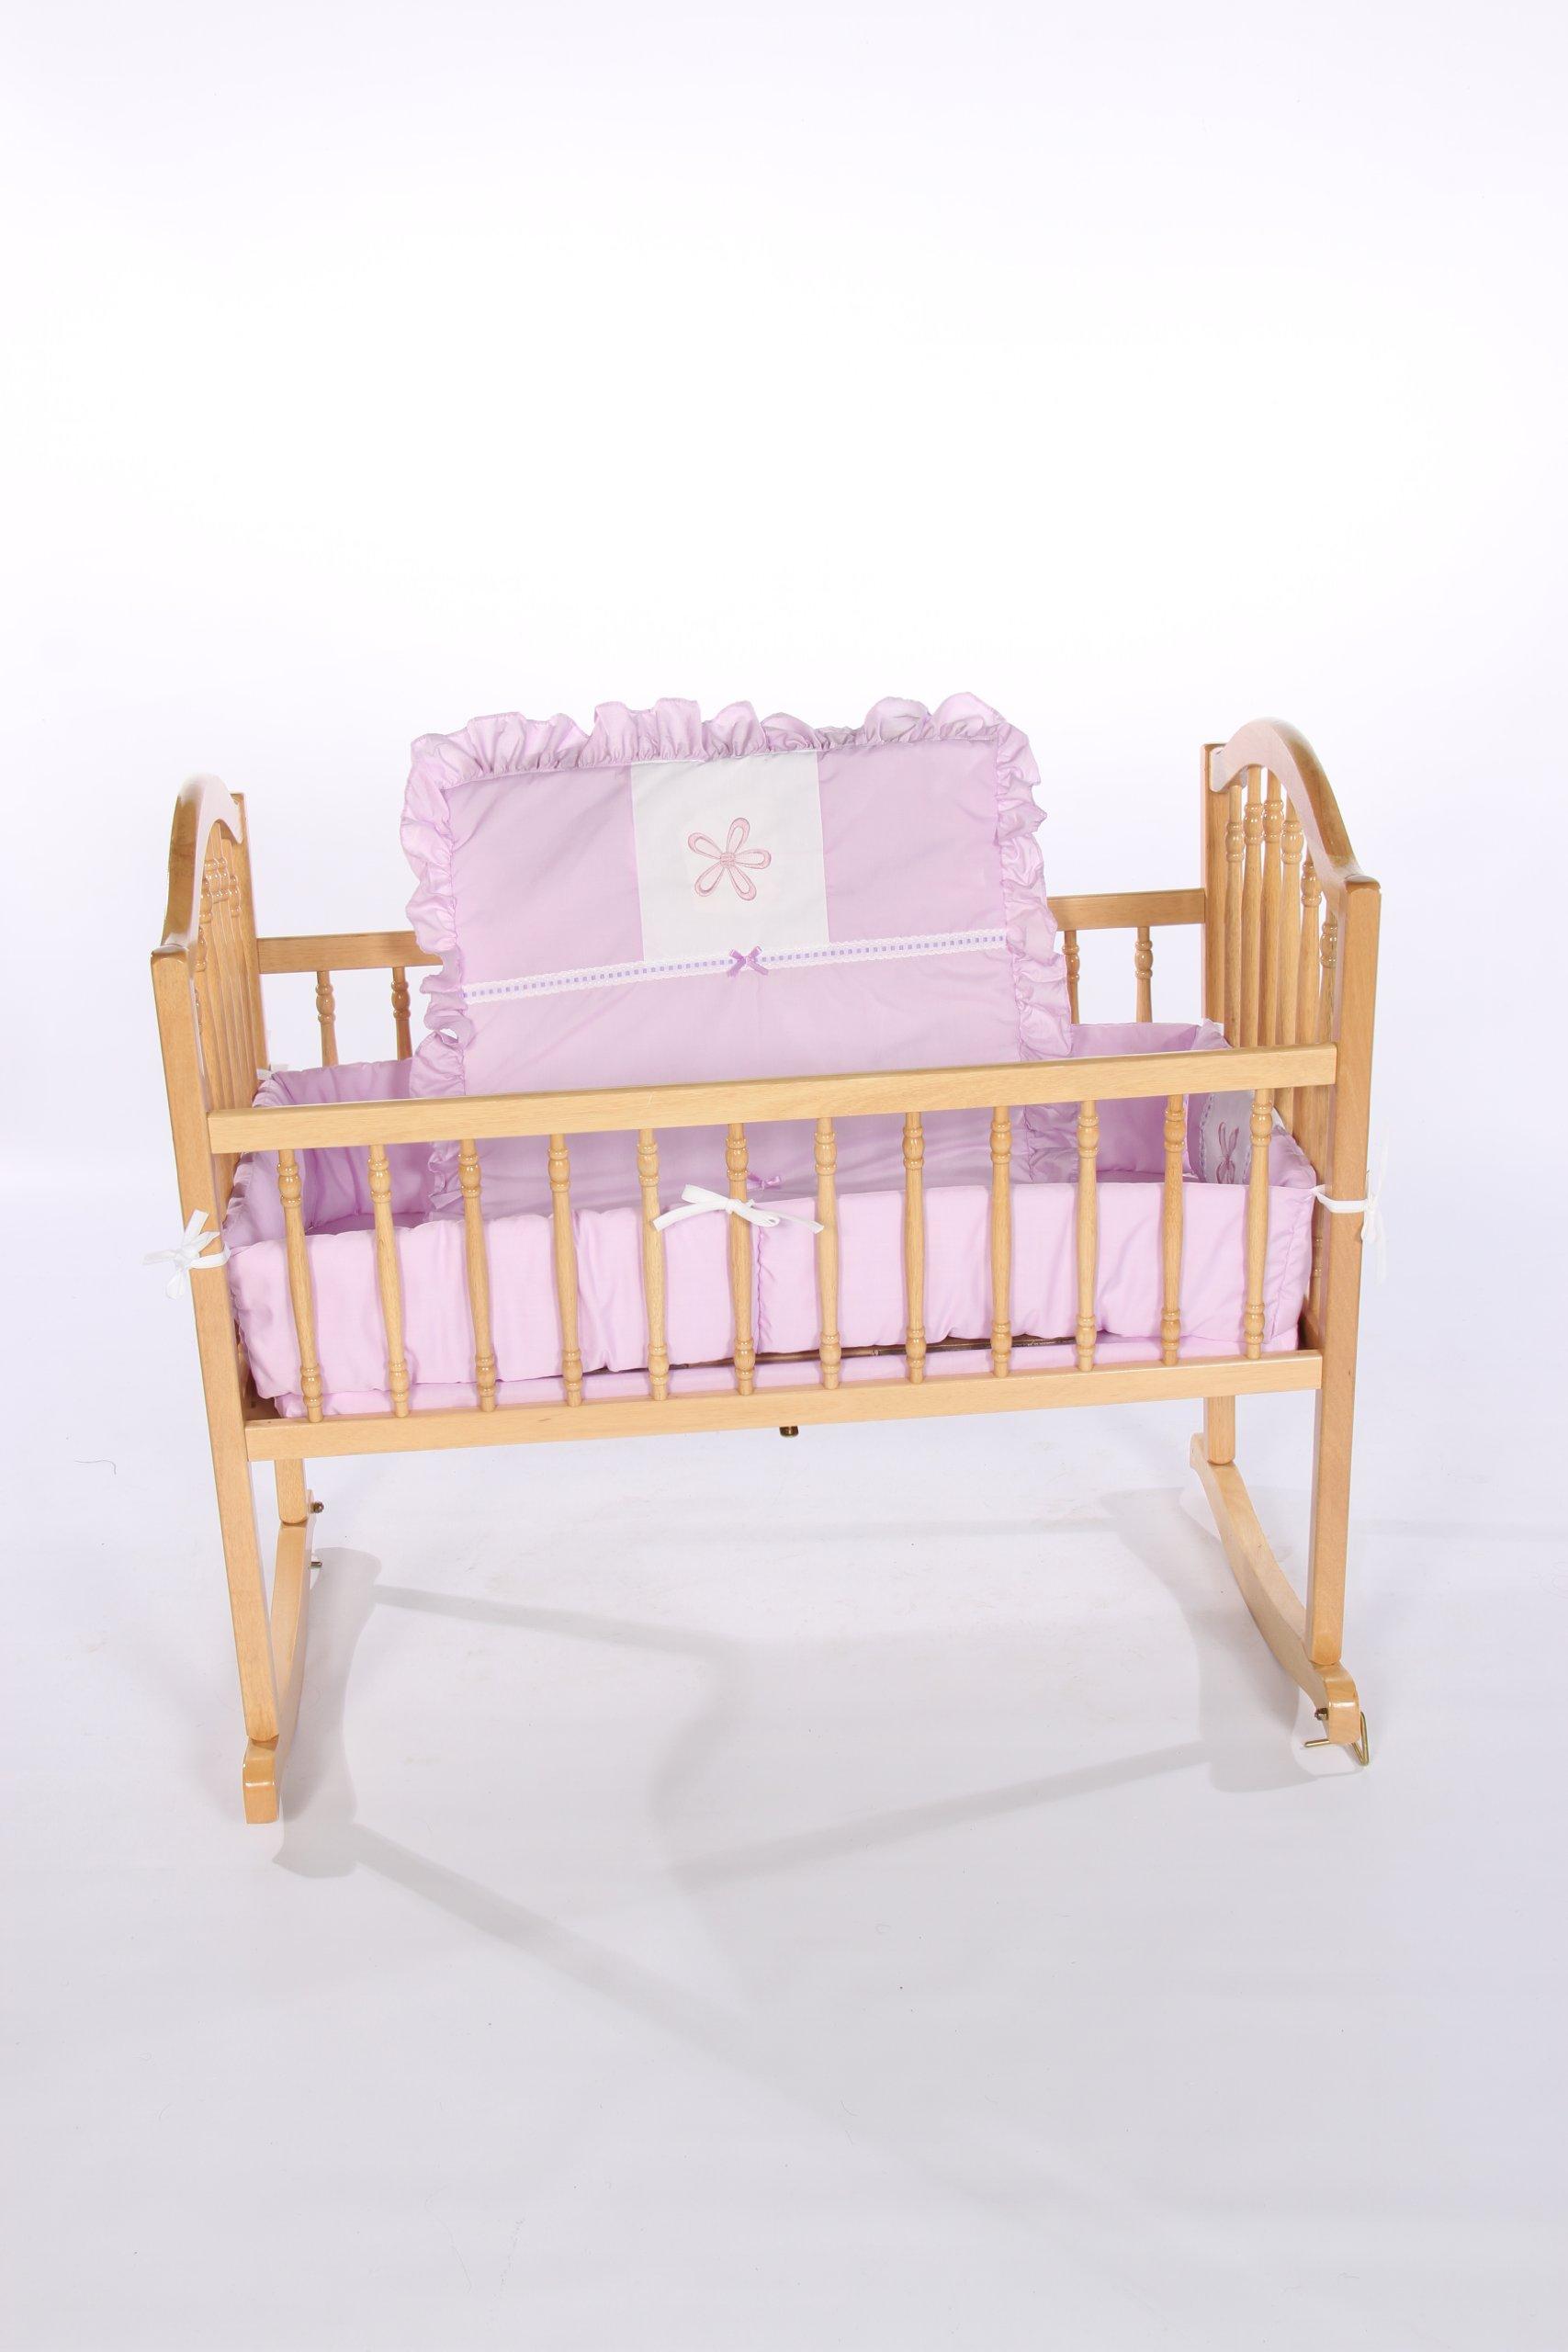 Baby Doll Bedding Solid with Flower Applique Cradle Bedding Set, Lavender